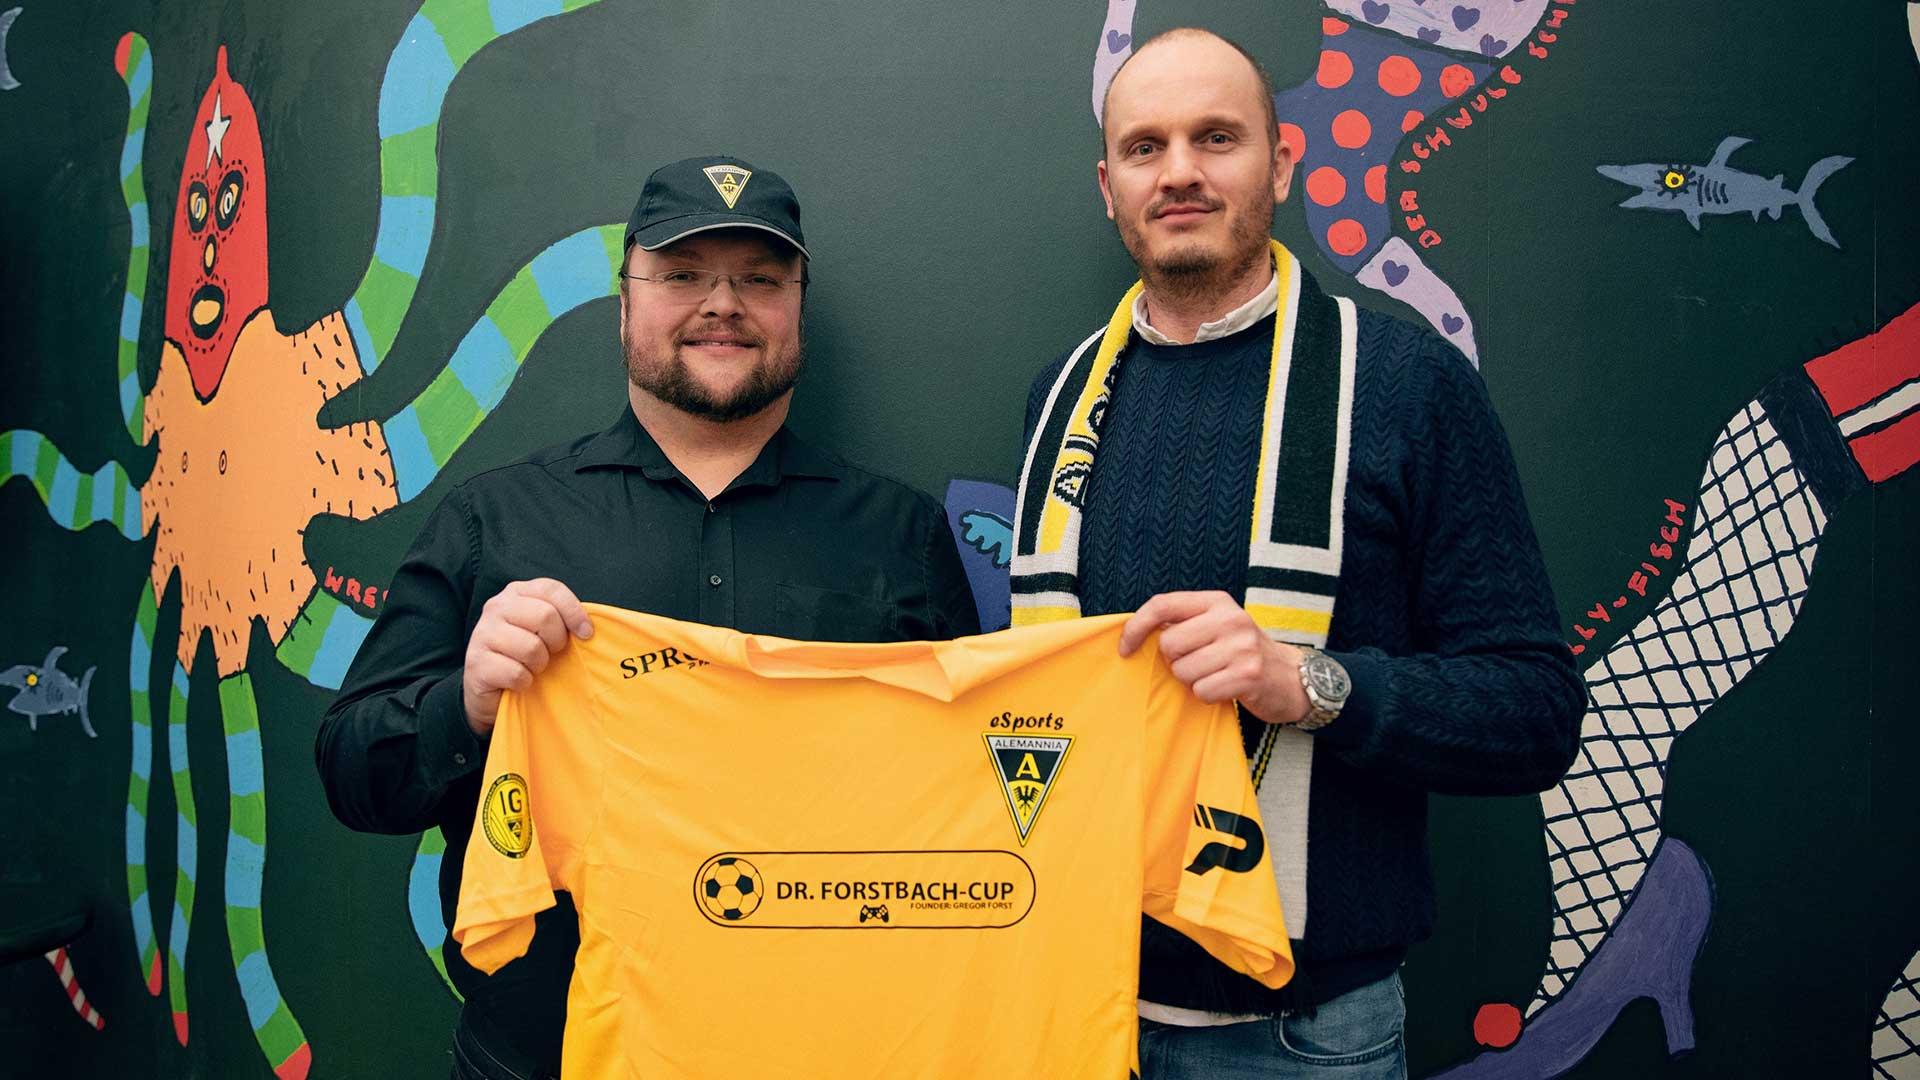 2020 01 22 Holger Hansen Gregor Forst Alemannia Aachen eSports l Bild Julia Raabe babt